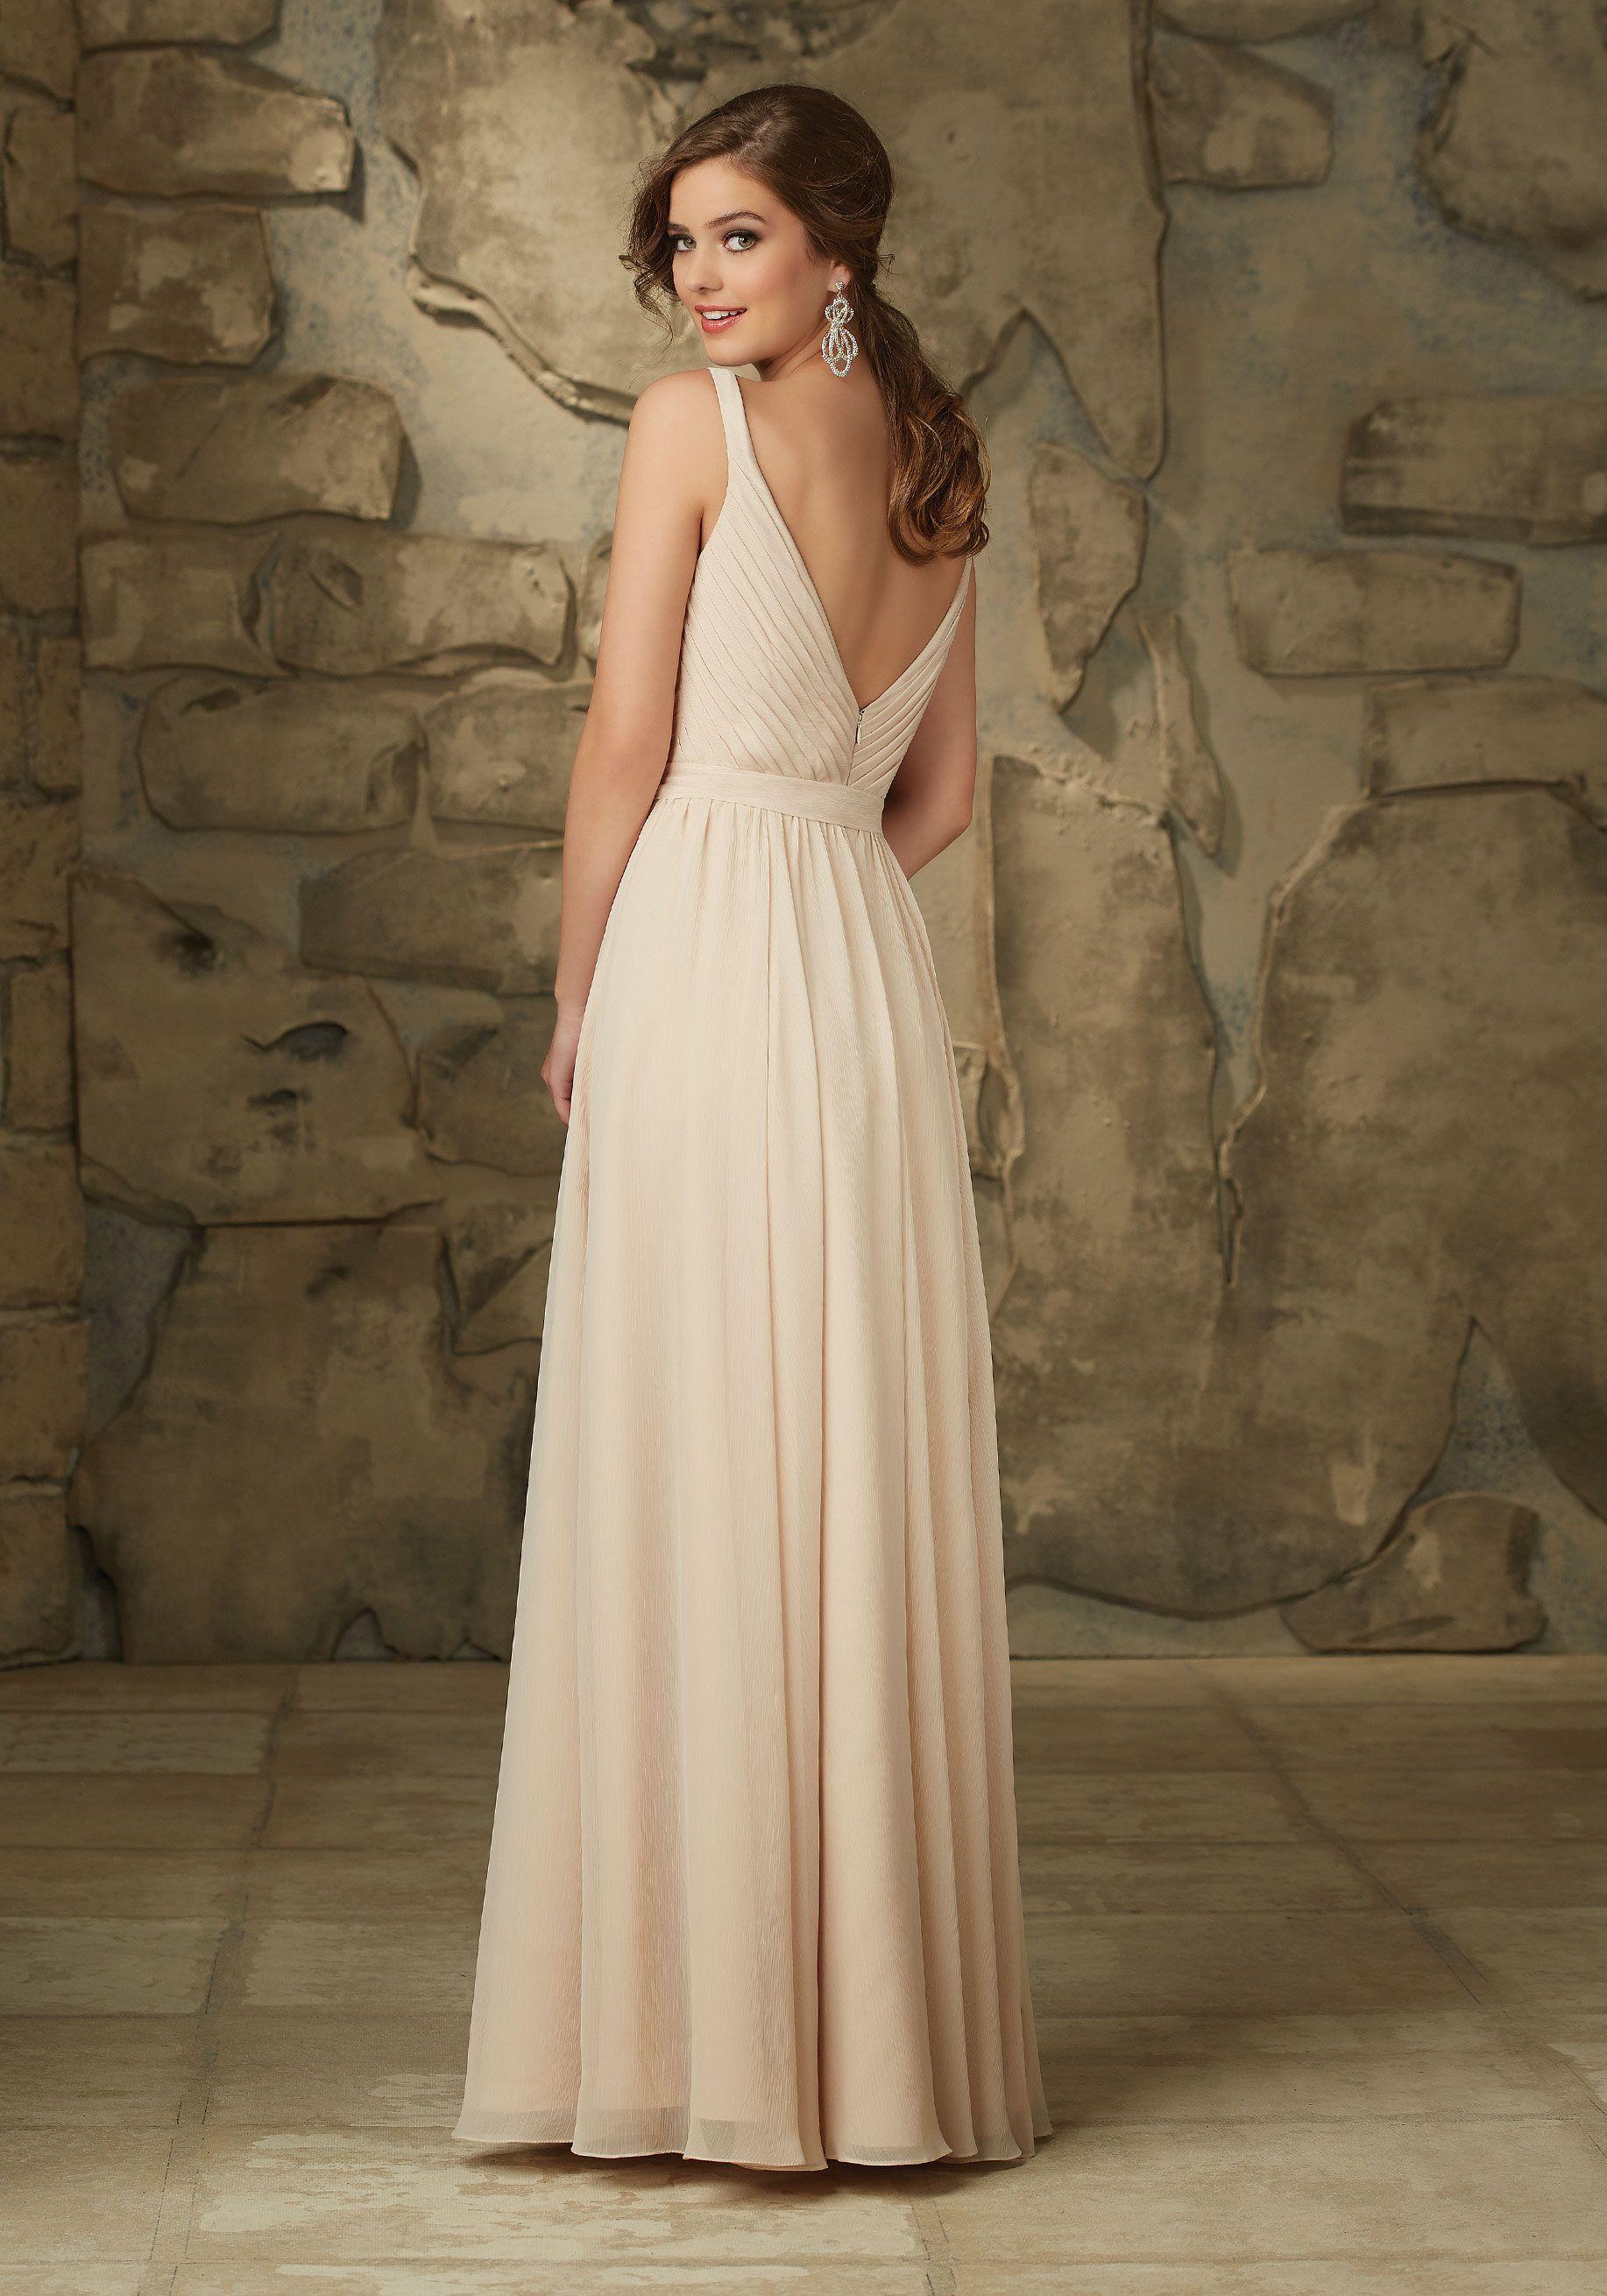 Pin by darlene schwartz on evening and wedding dresses pinterest